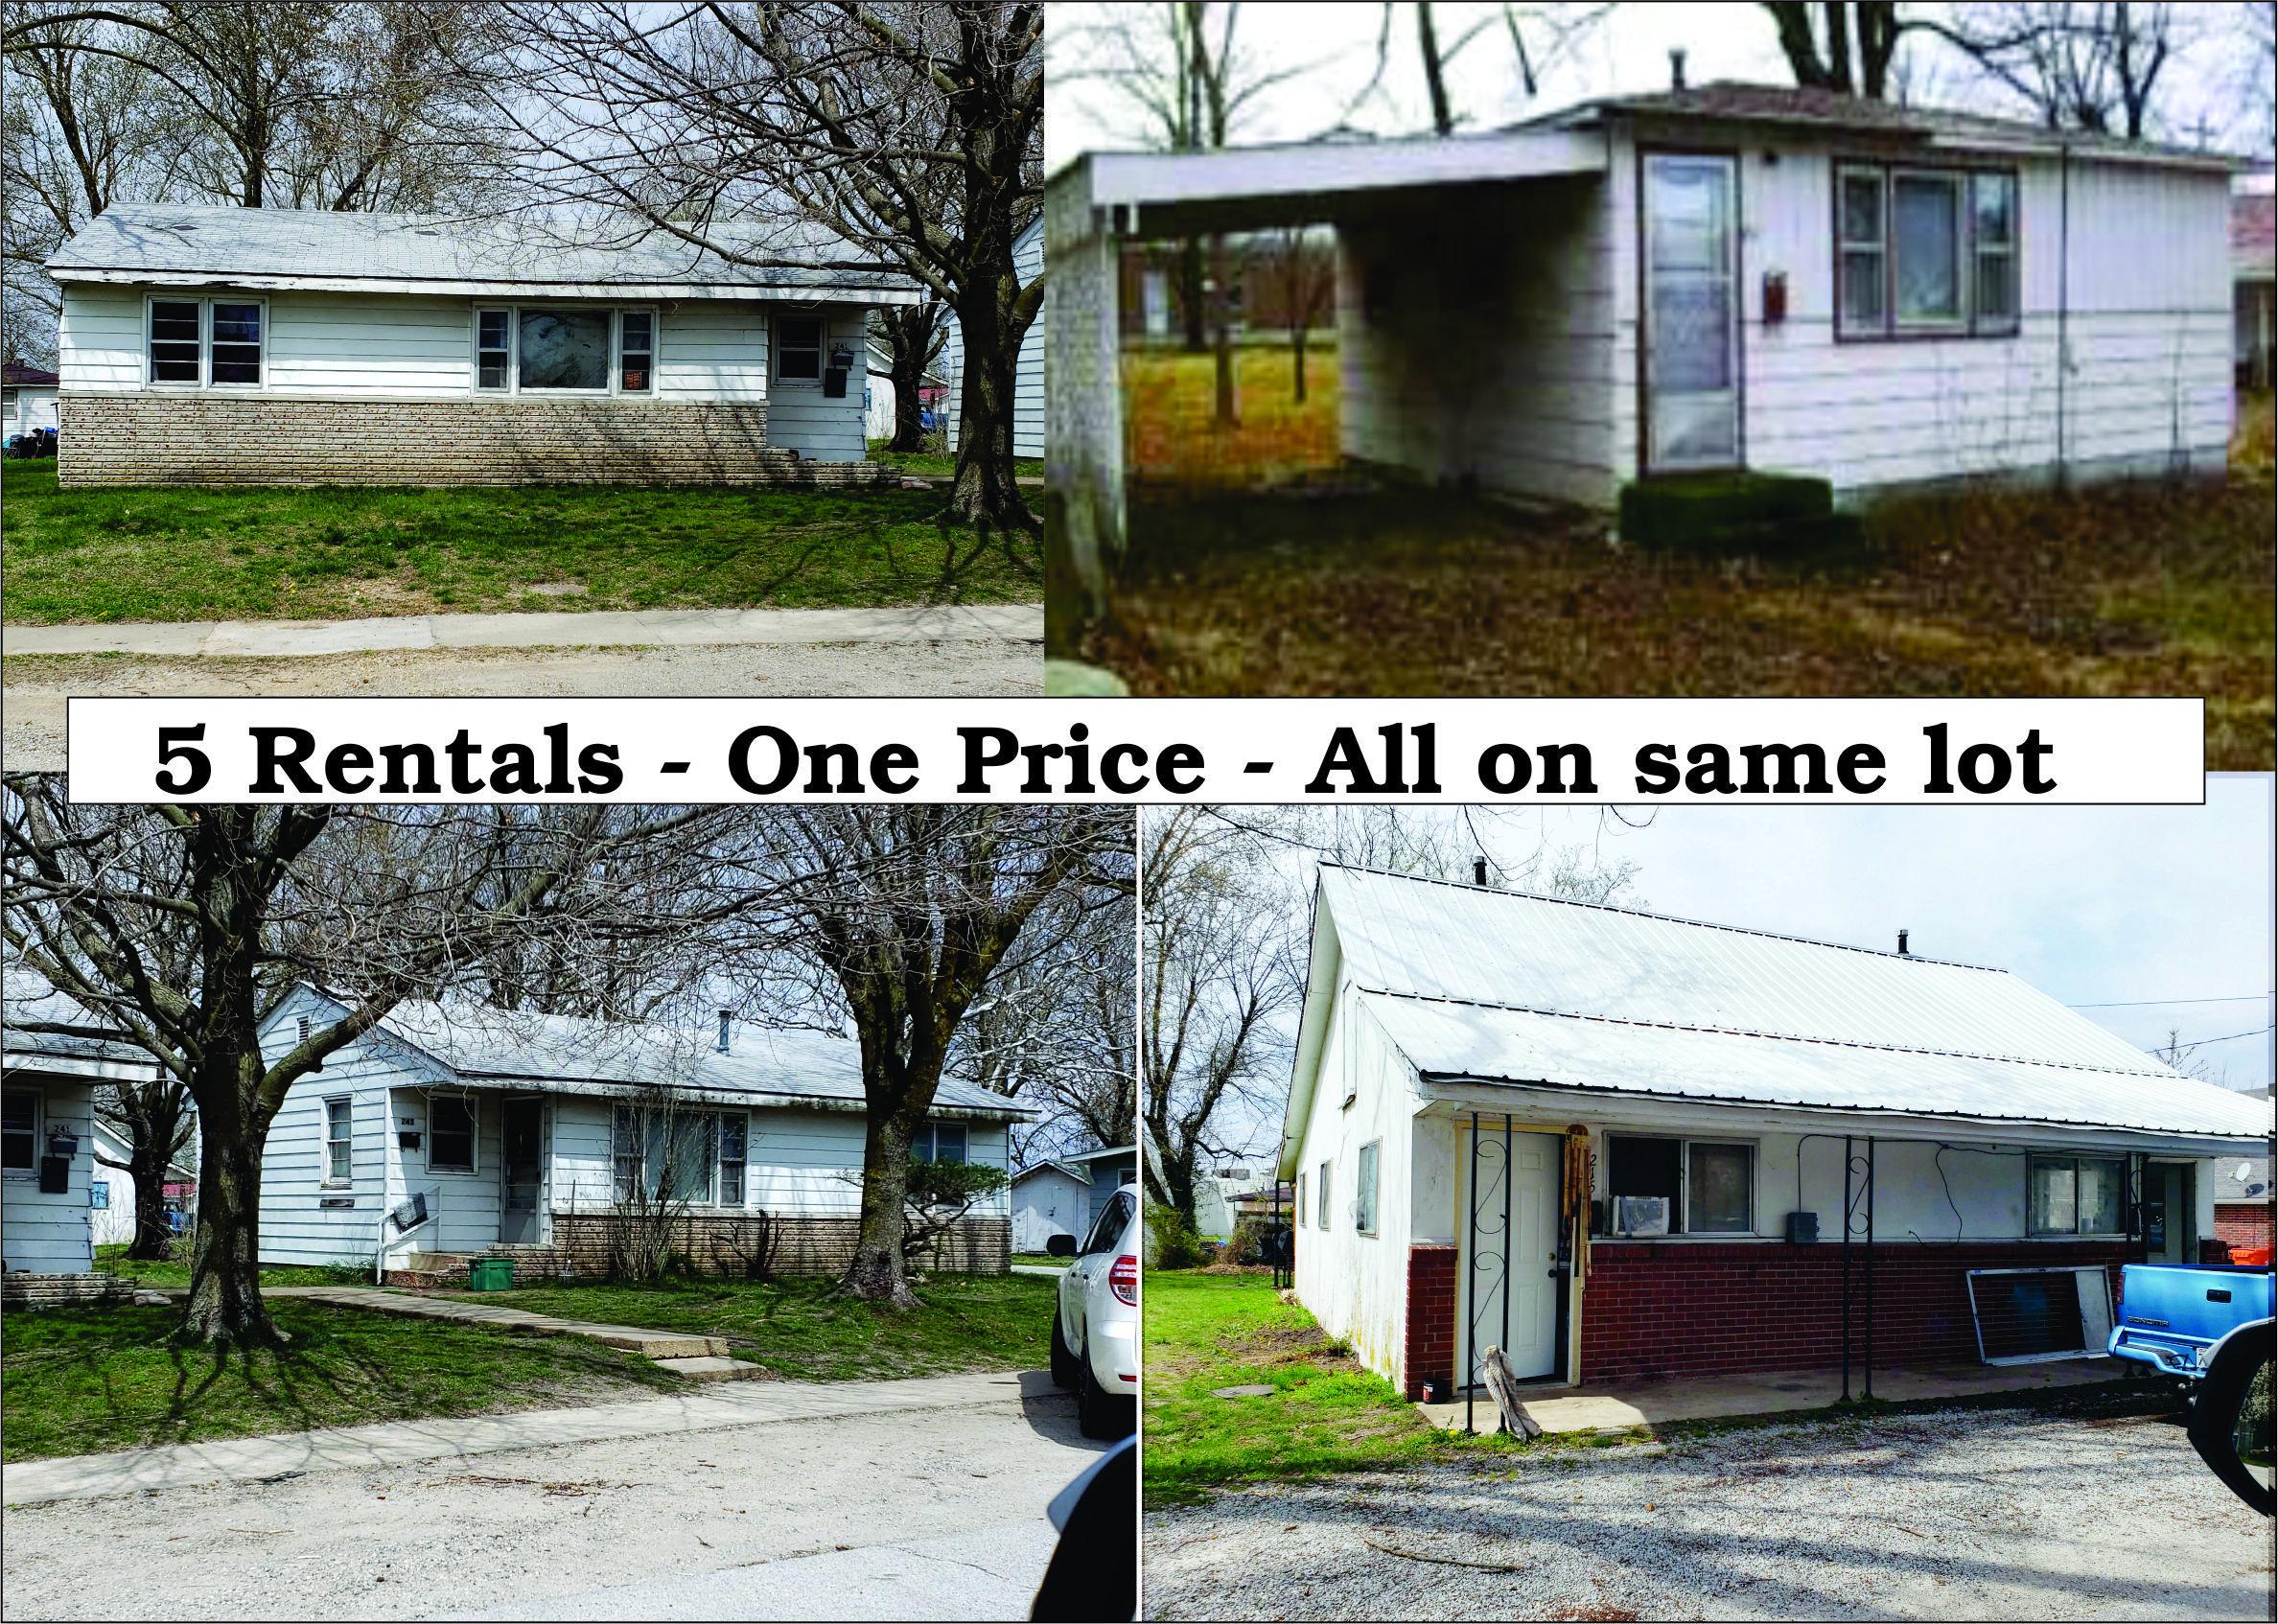 241 East Jefferson Street, Marshfield, Missouri 65706